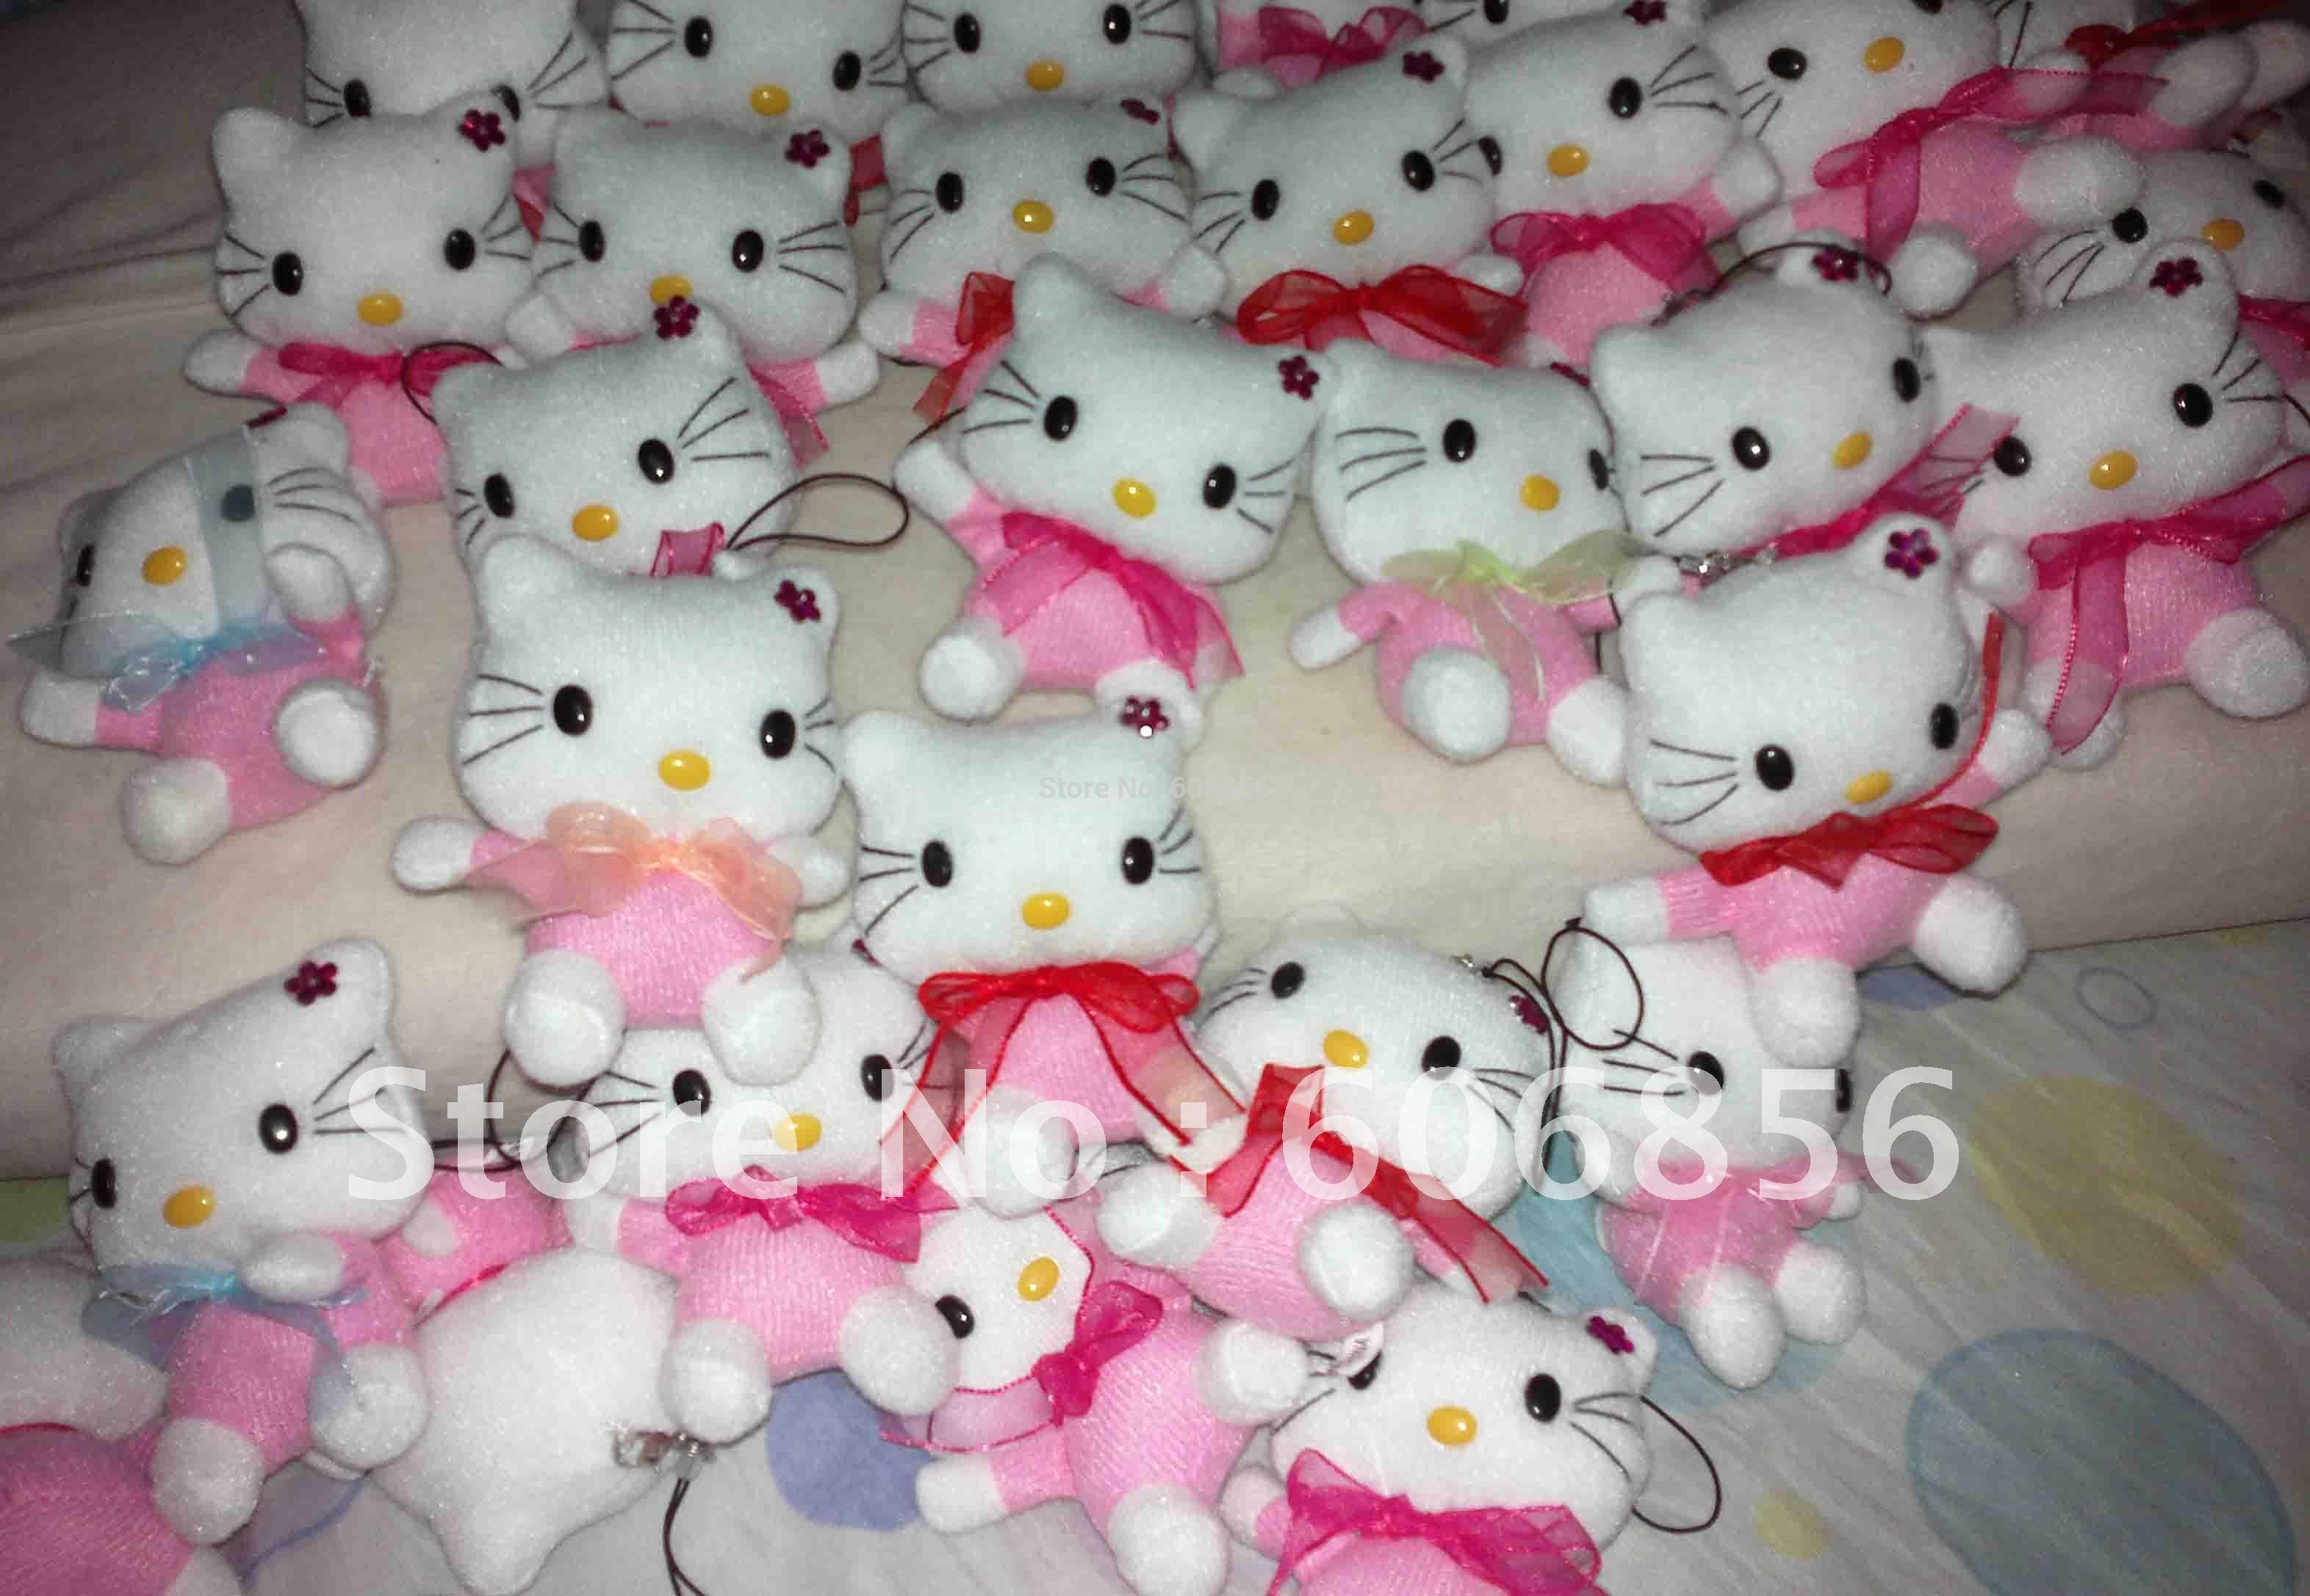 2019 Wholesale Hello Kitty Plush Dolls Soft Toys 7cm Size Hot Dolls